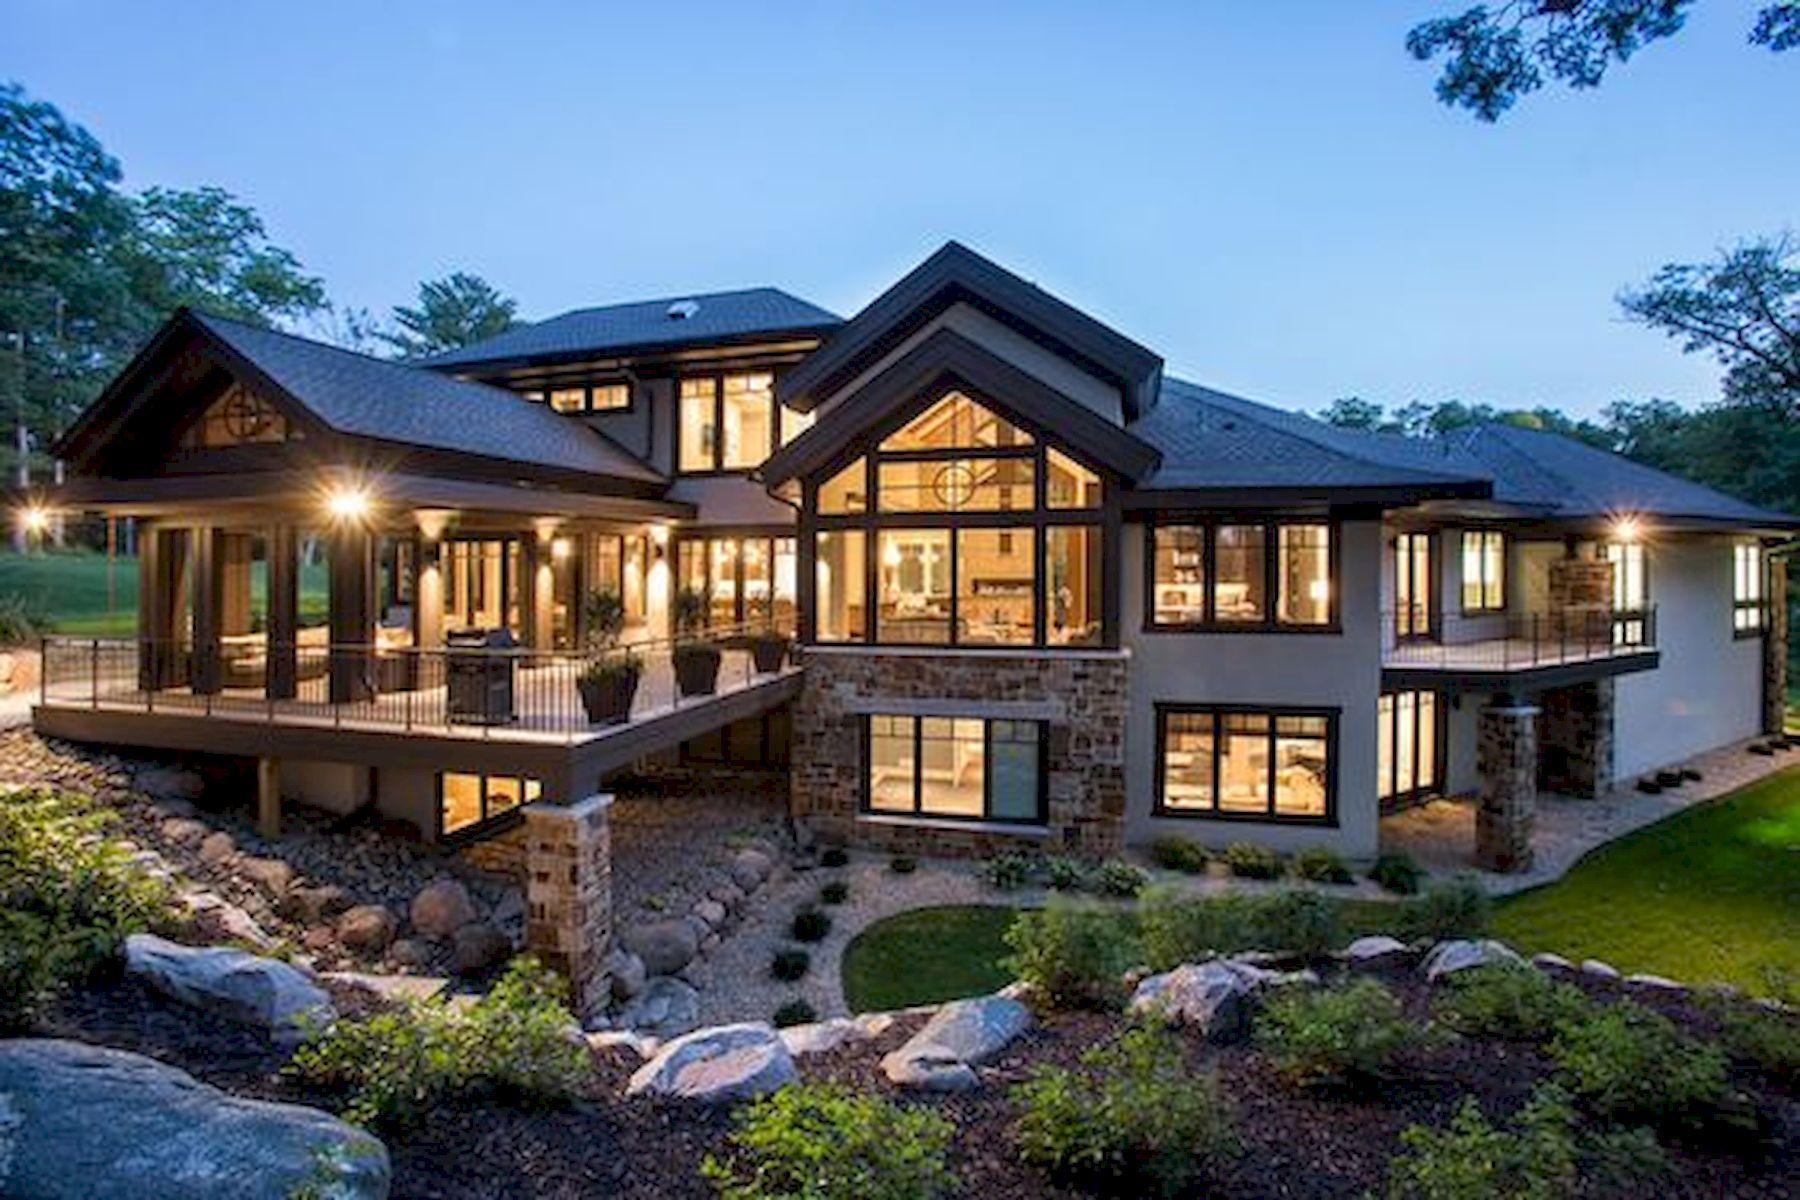 16 Cozy Look Modern Dream House Exterior Design In 2020 Dream House Exterior House Designs Exterior Brick Exterior House